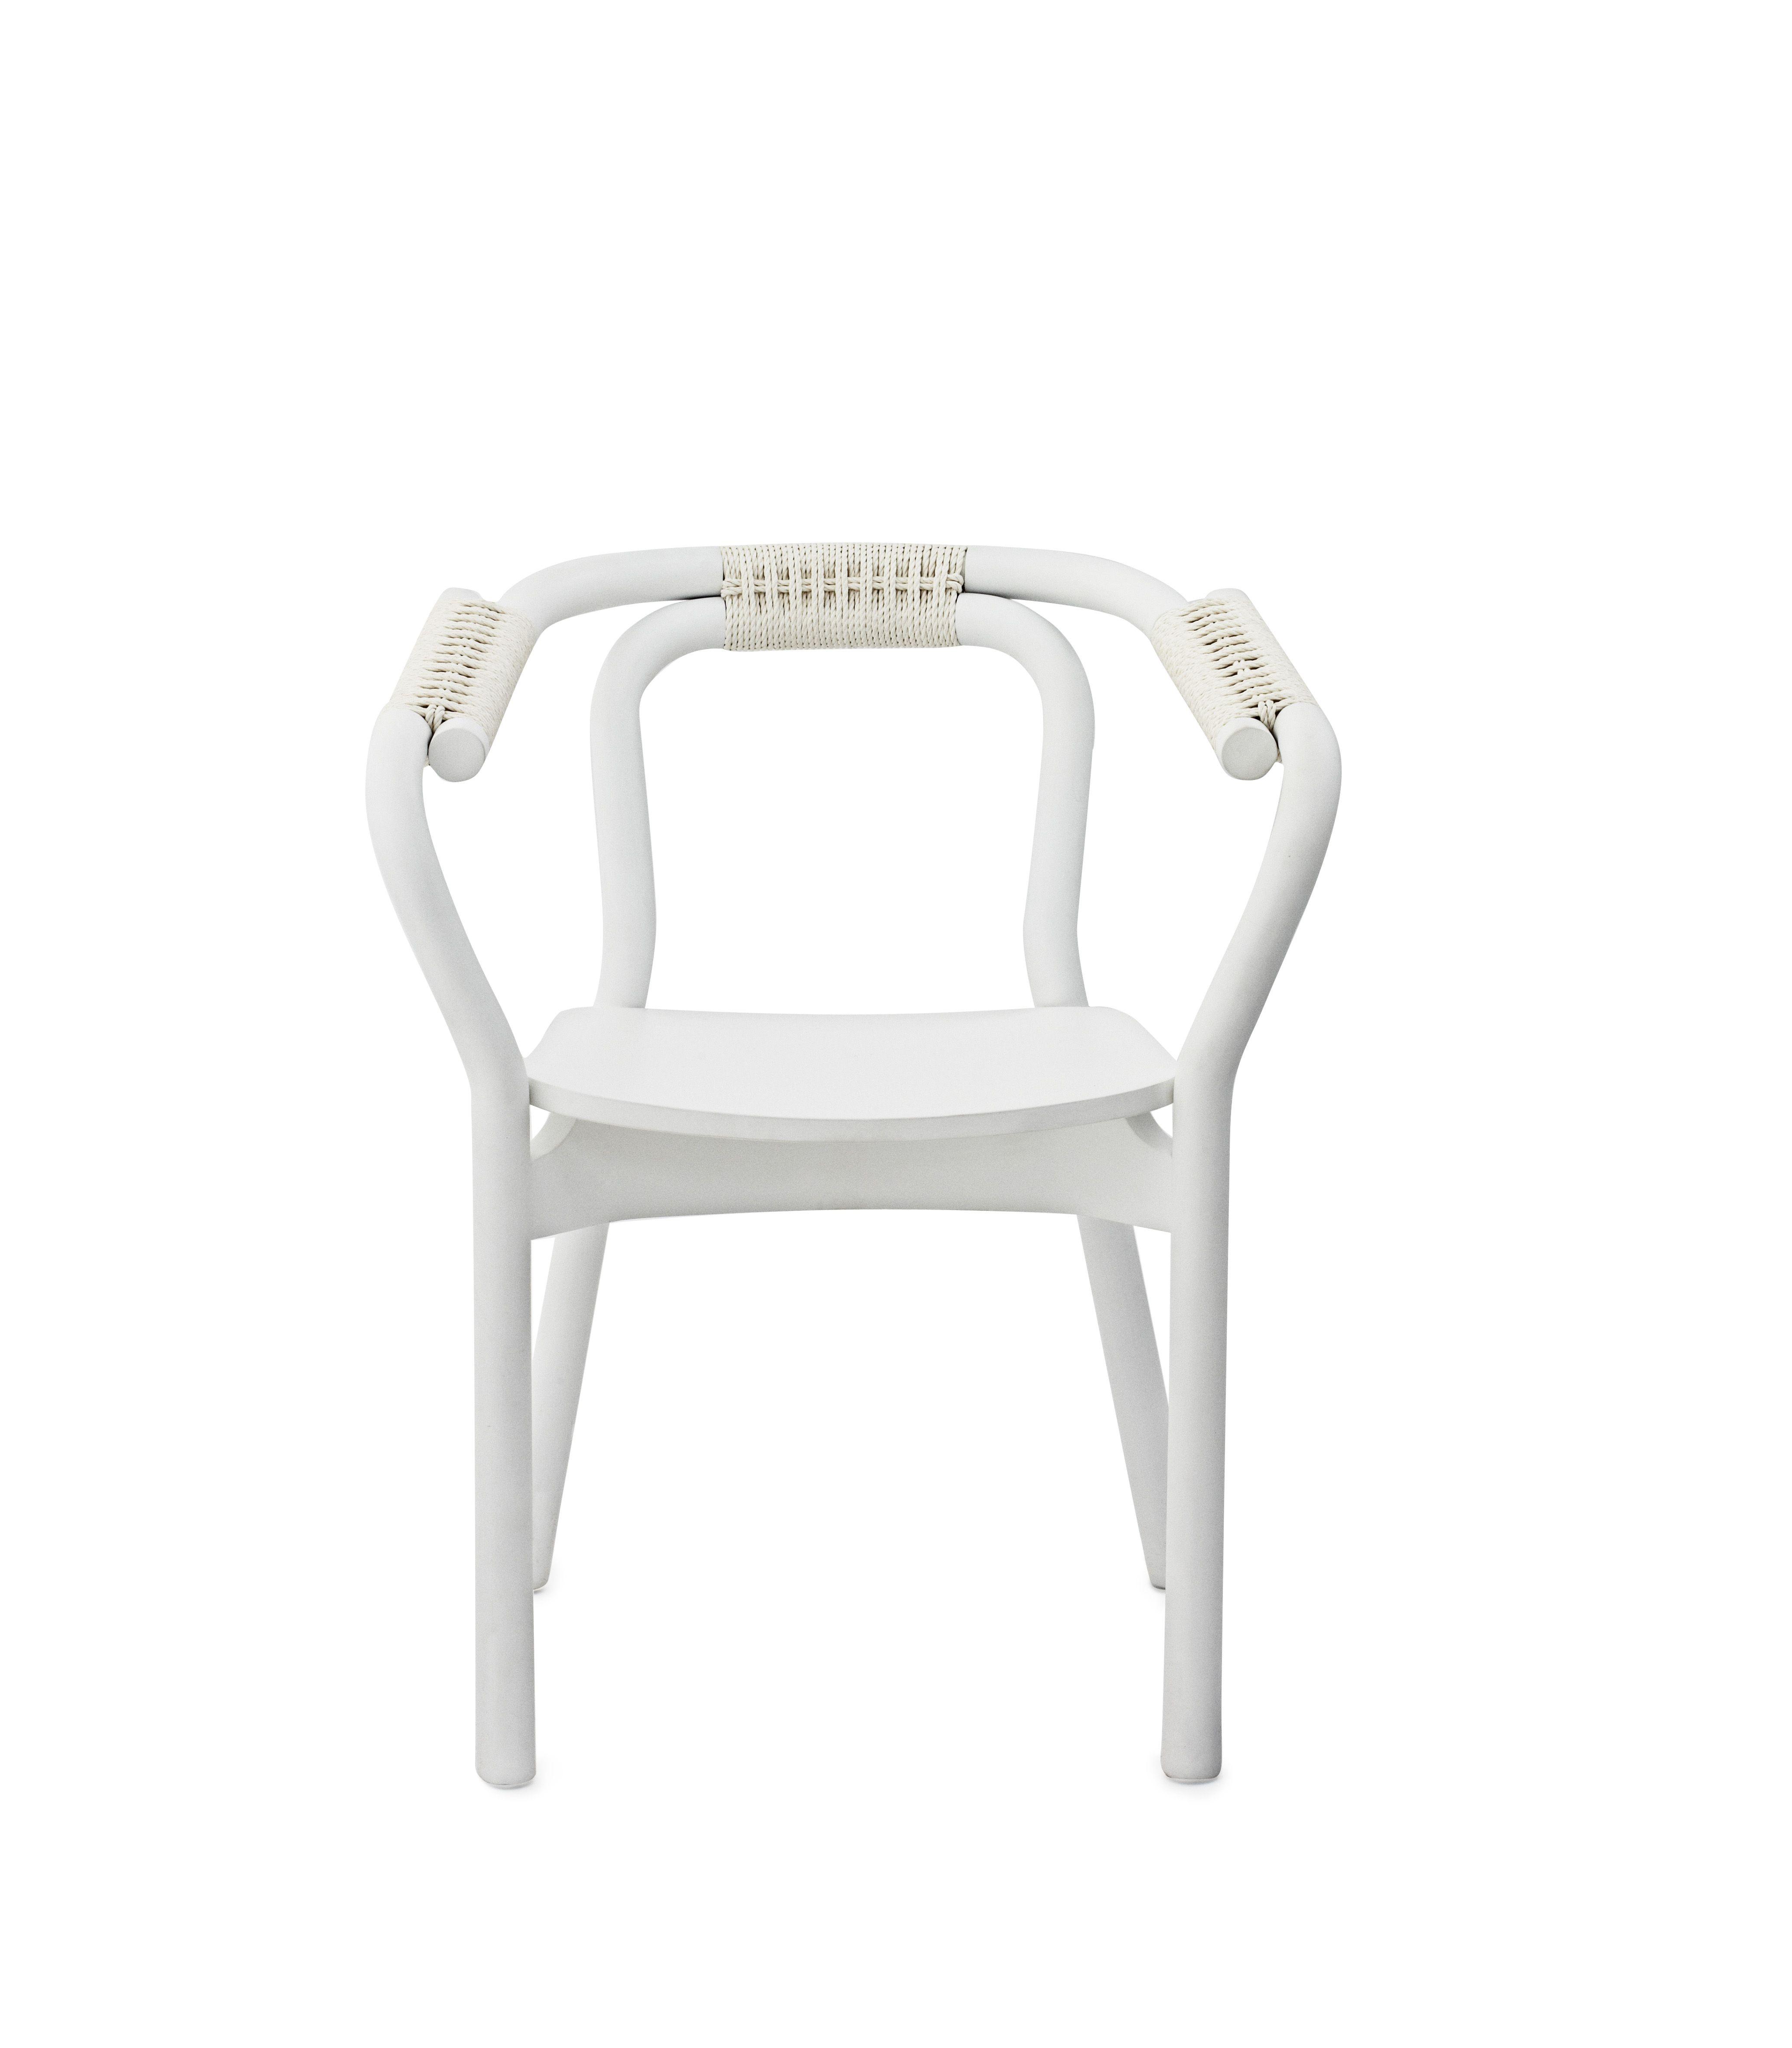 #White #chair #silla #nudo en #blanco